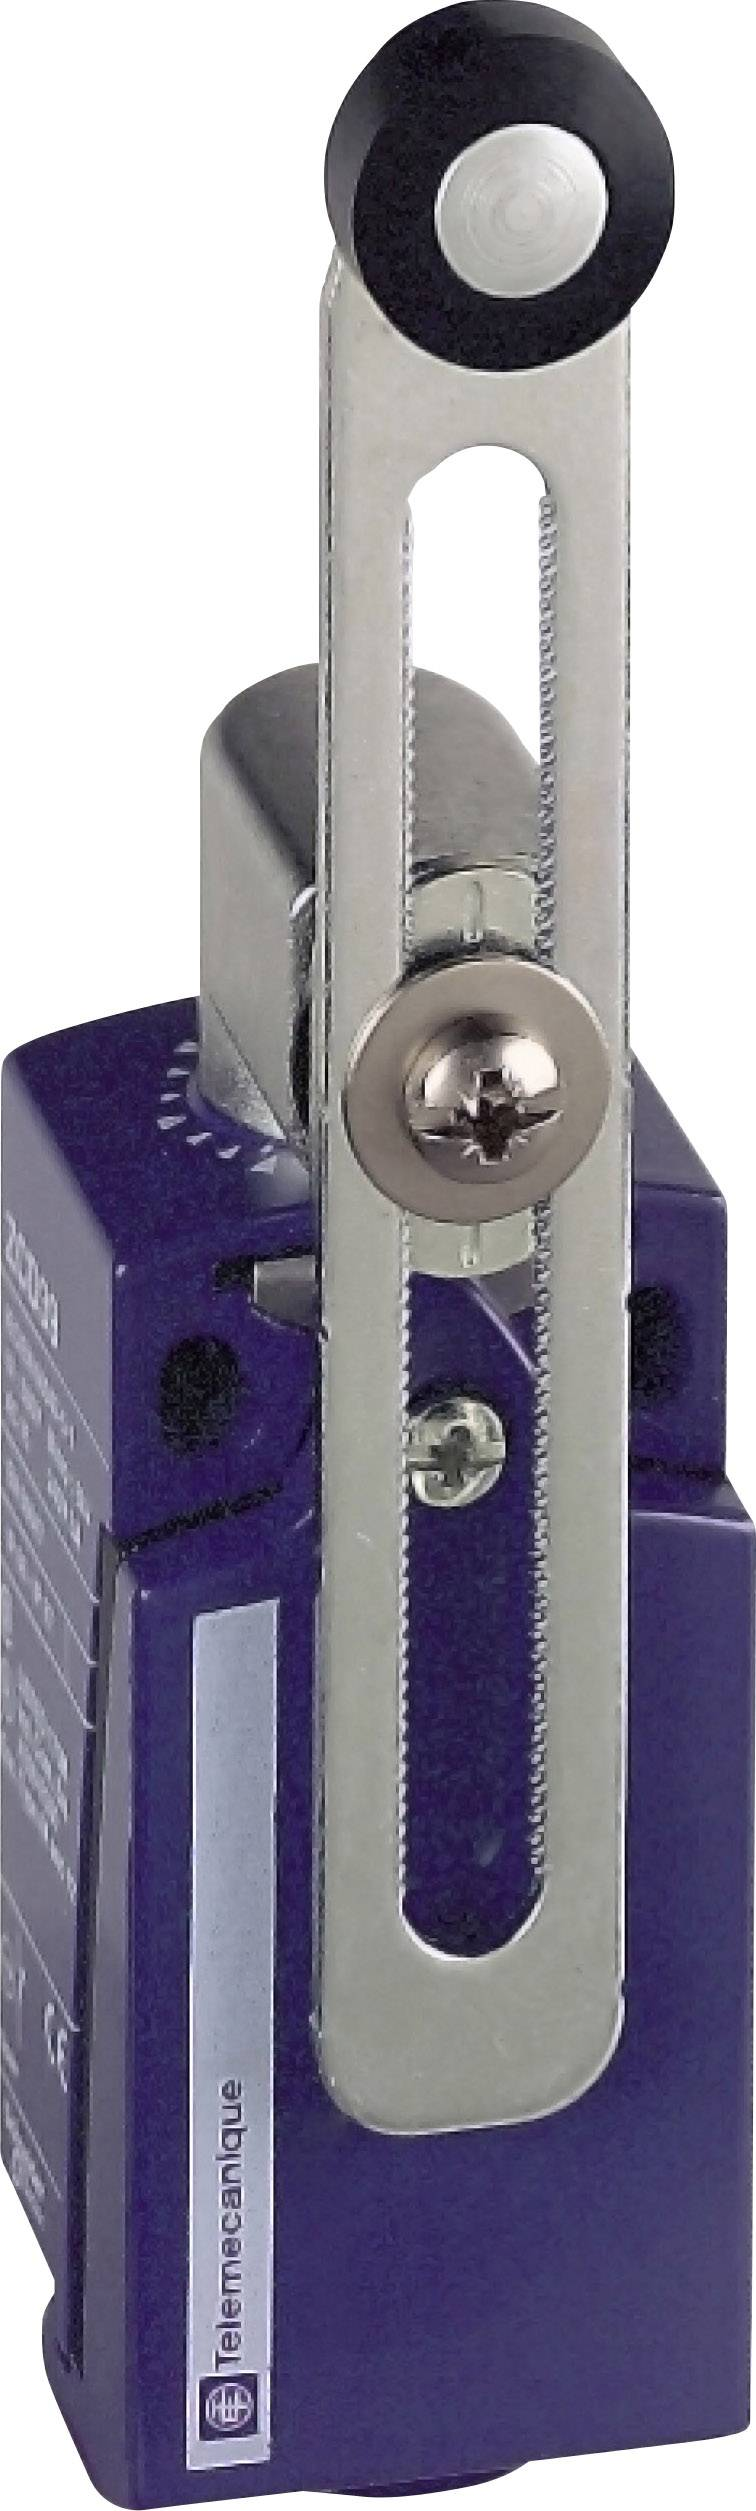 Koncový spínač Schneider Electric XCKD2145P16, páka s rolnou, bez aretace, IP67, 1 ks